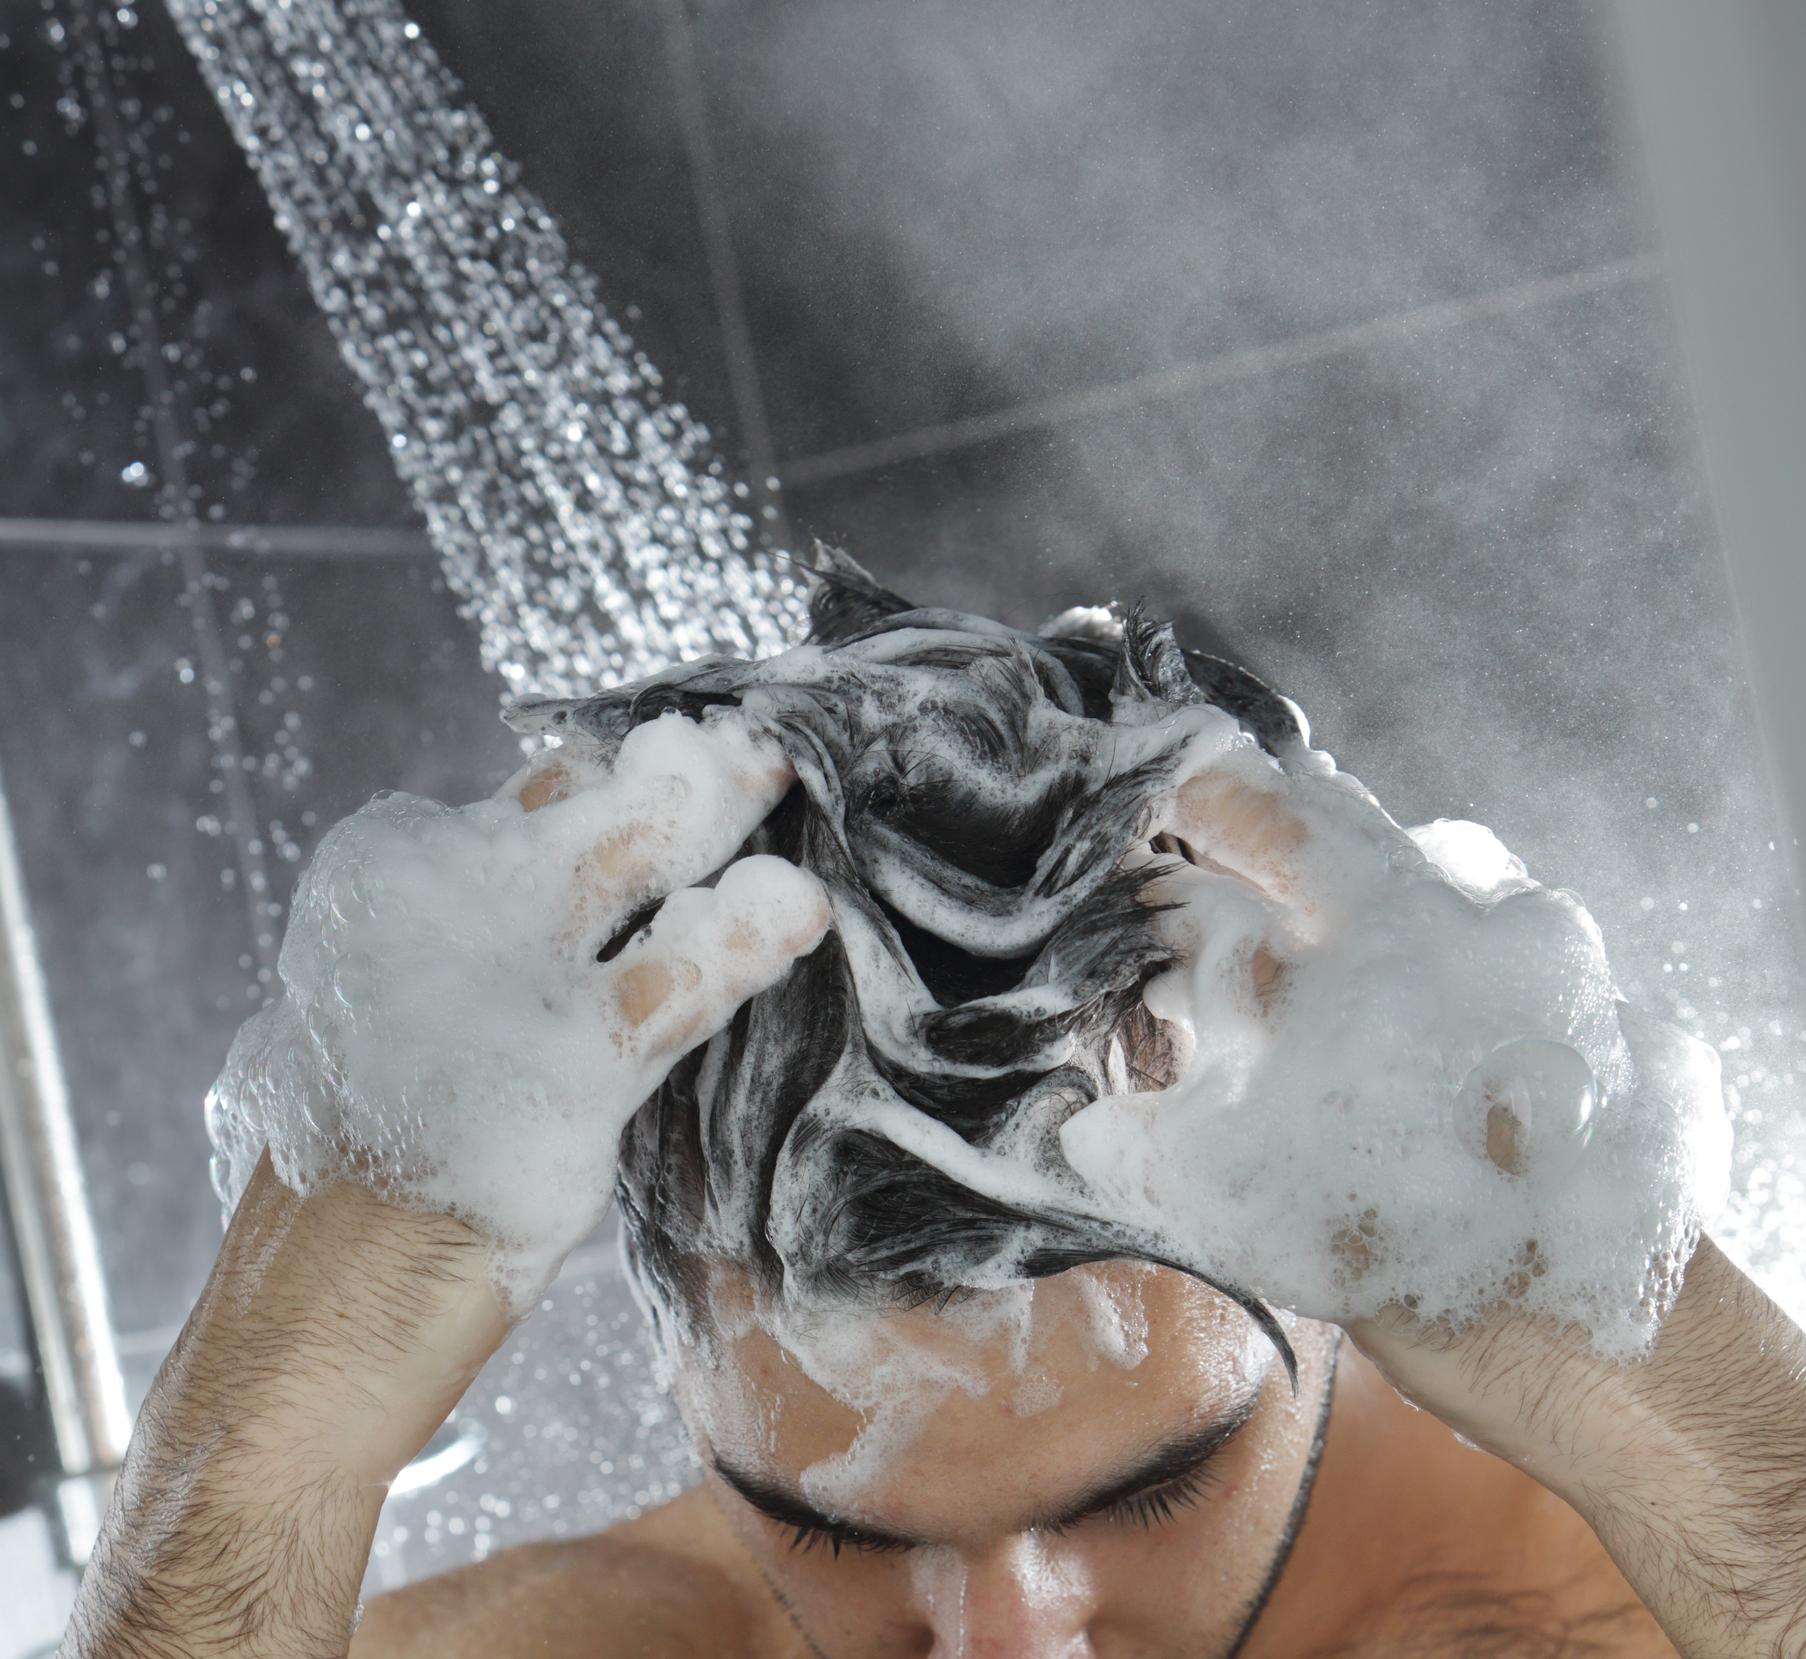 hajhullas-elleni-sampon-ferfiaknak